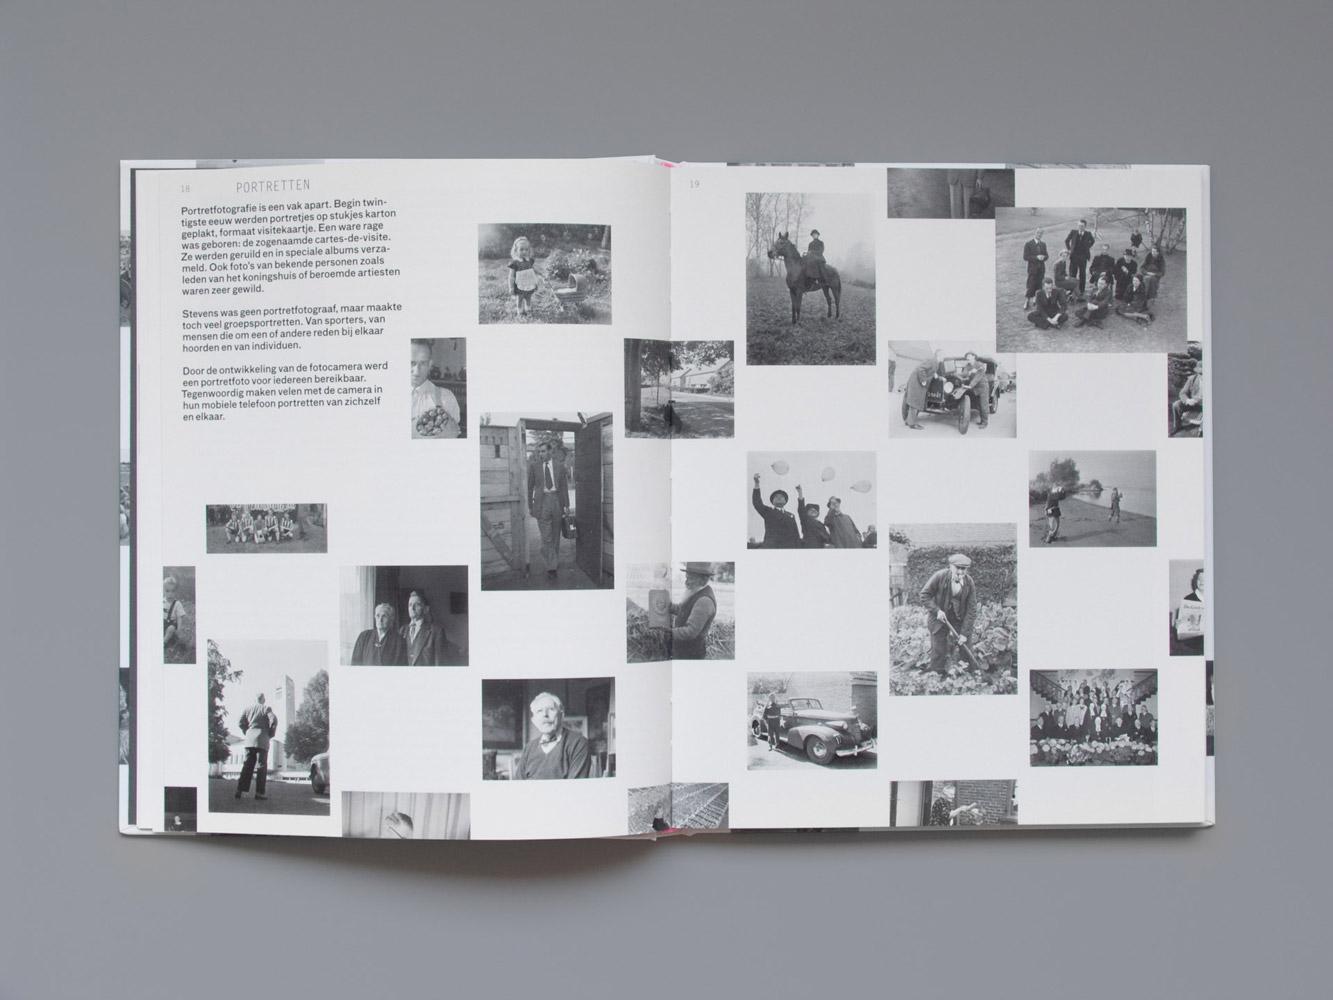 museum hilversum jacques stevens boek nr 3 jpg